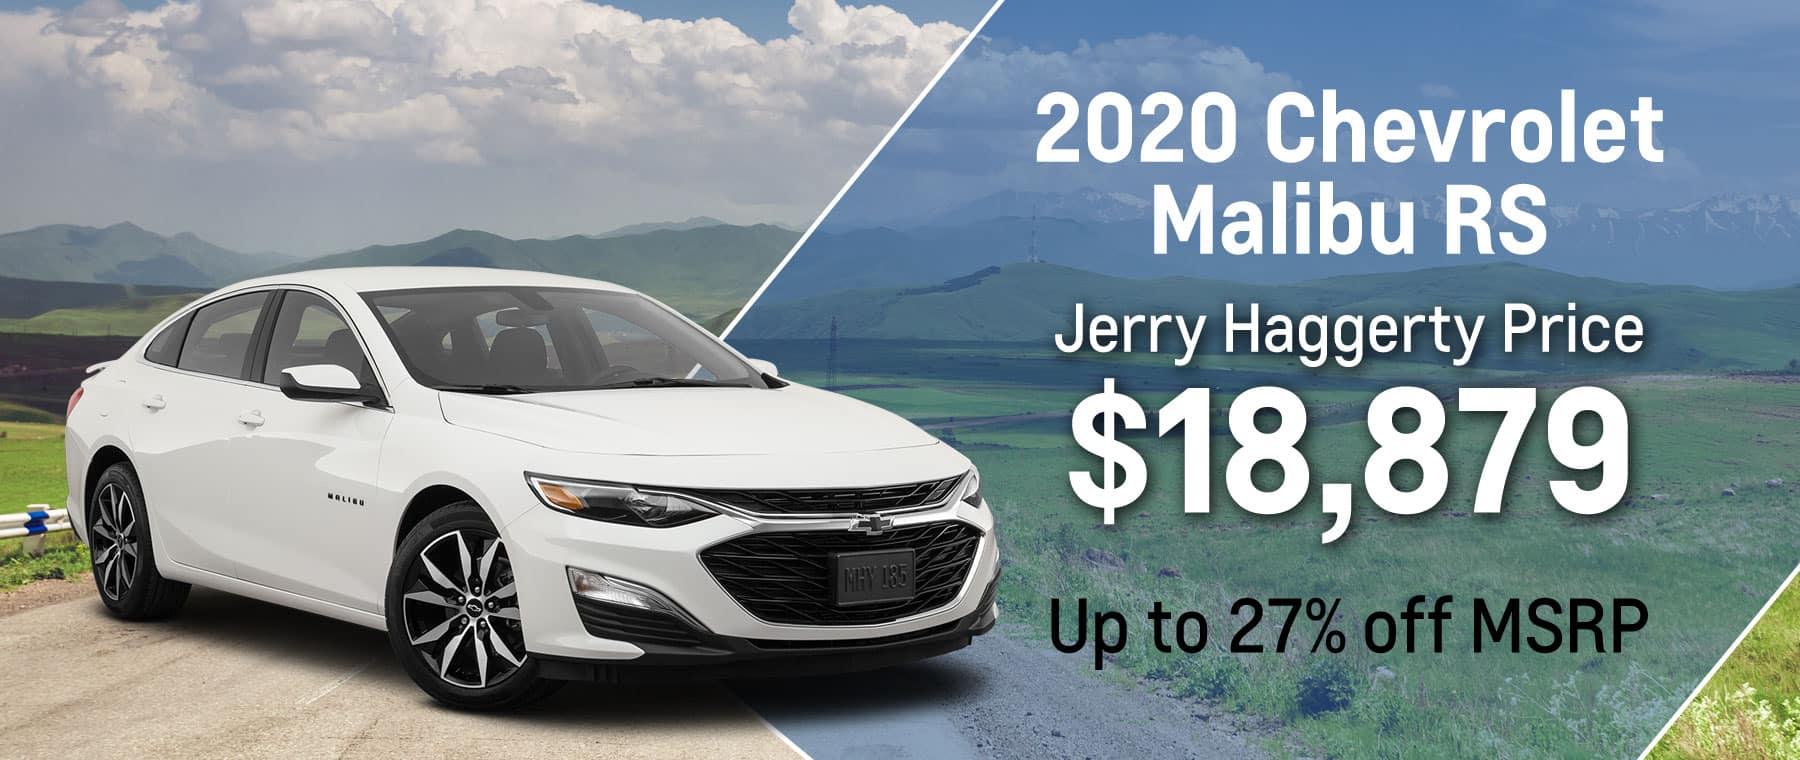 2020 Malibu RS April 2021 Offer